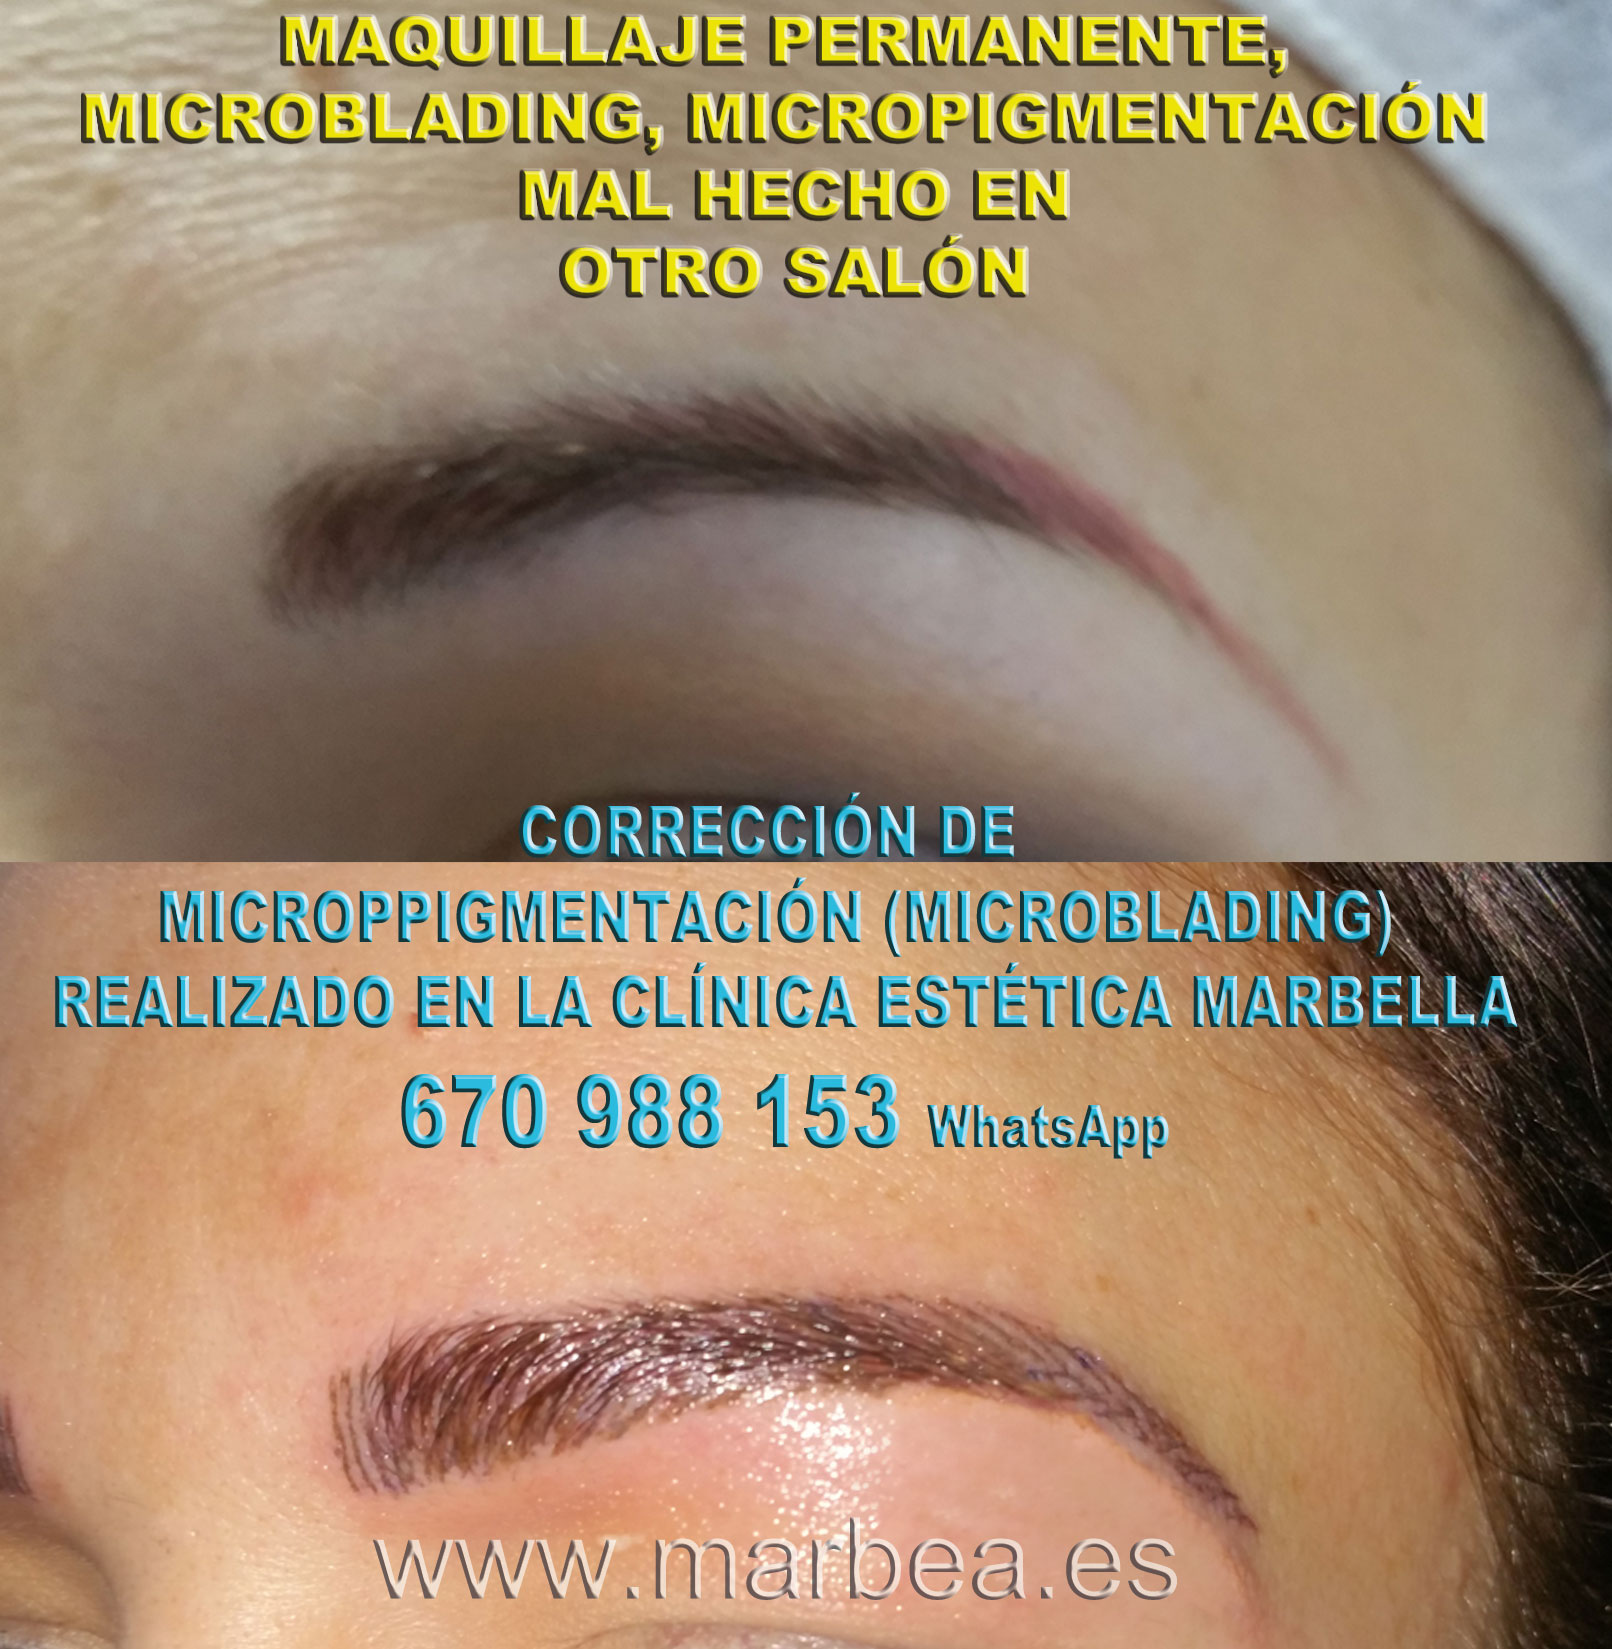 Borrar maquillaje permanente mal hecha clínica estética microblading ofrece eliminar la micropigmentación de cejas,micropigmentación correctiva cejas mal hecha